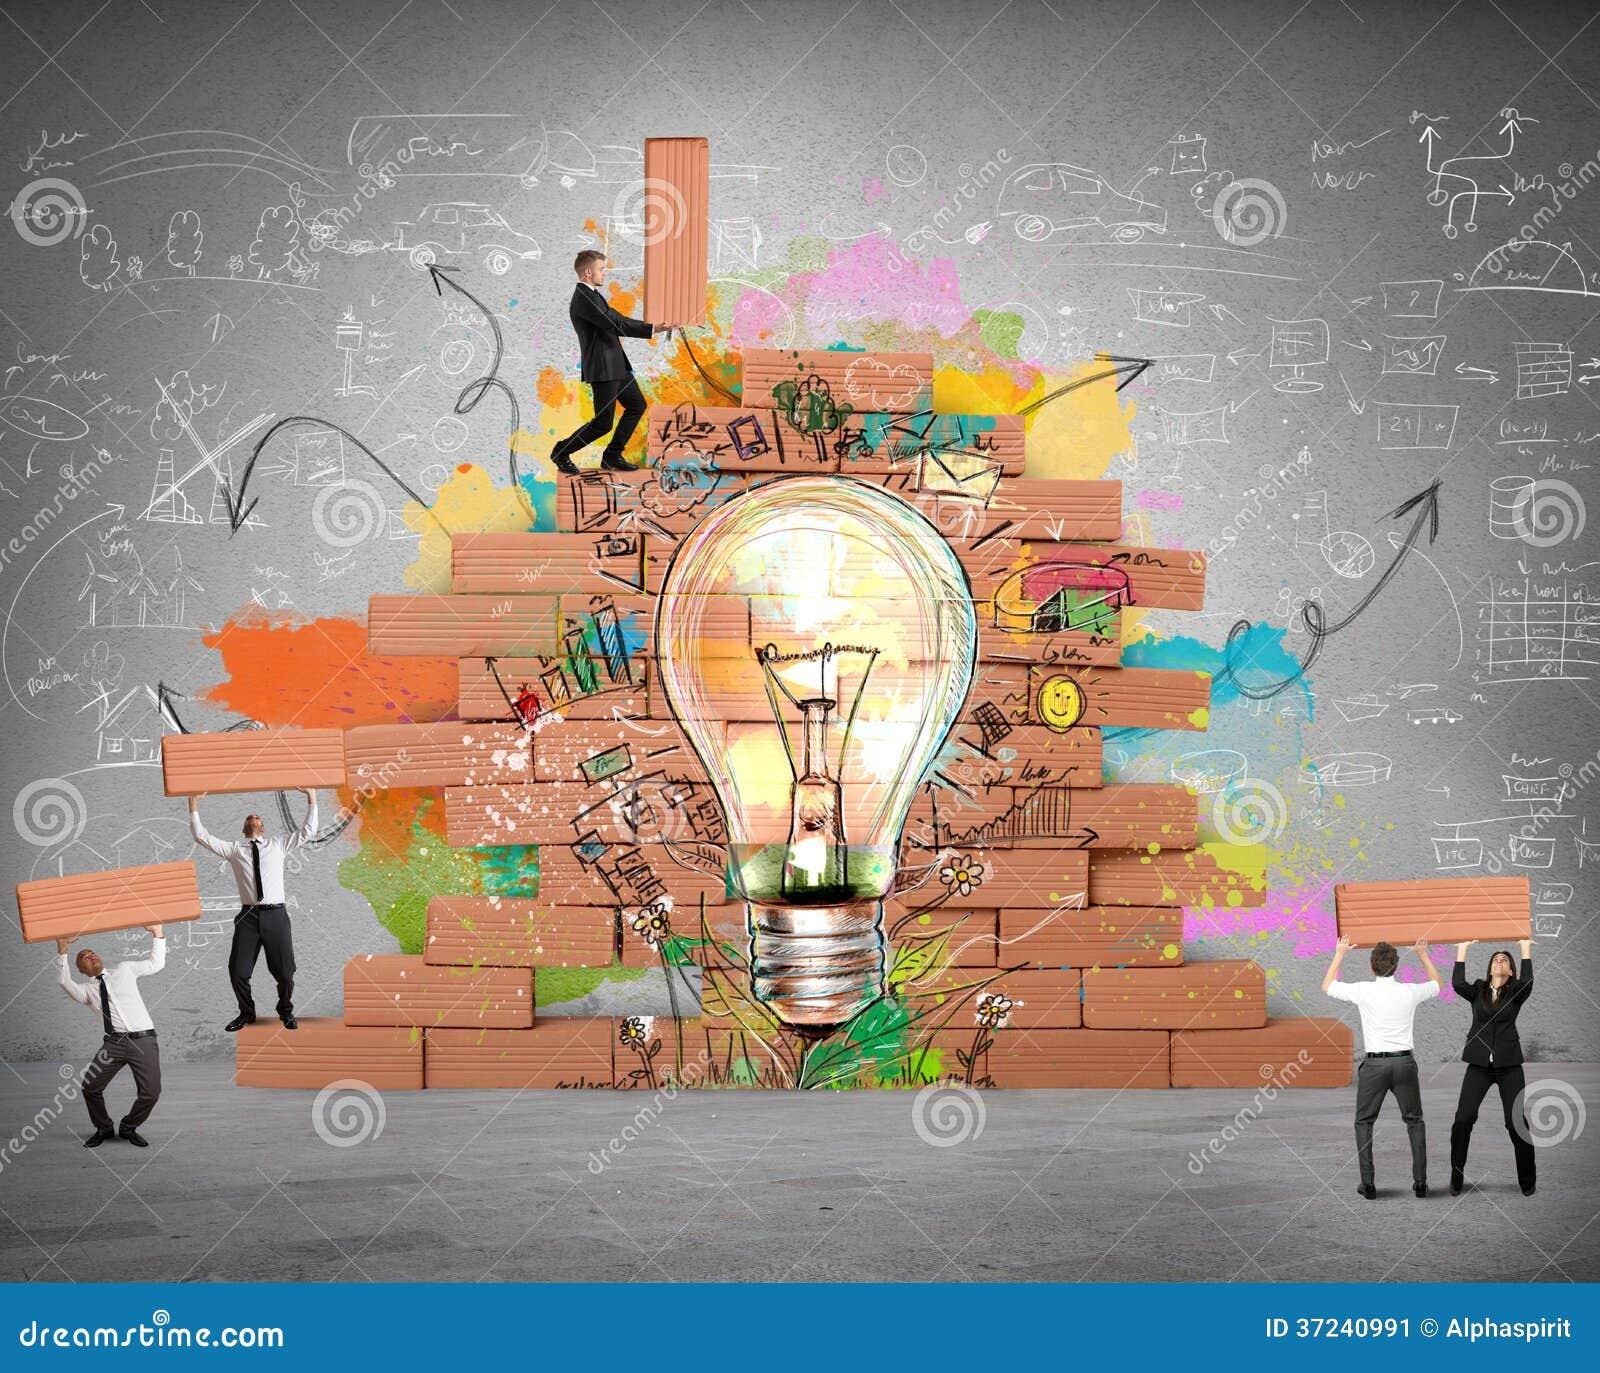 Bulding a new creative idea